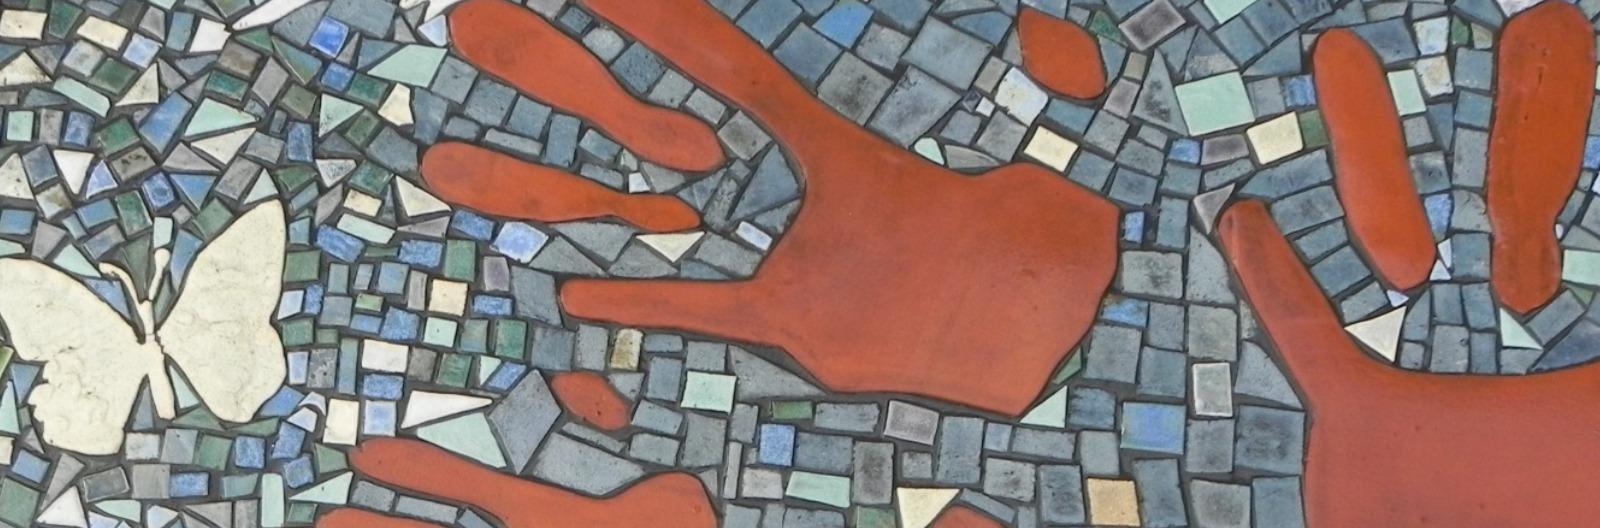 Enquiry hands mosaic